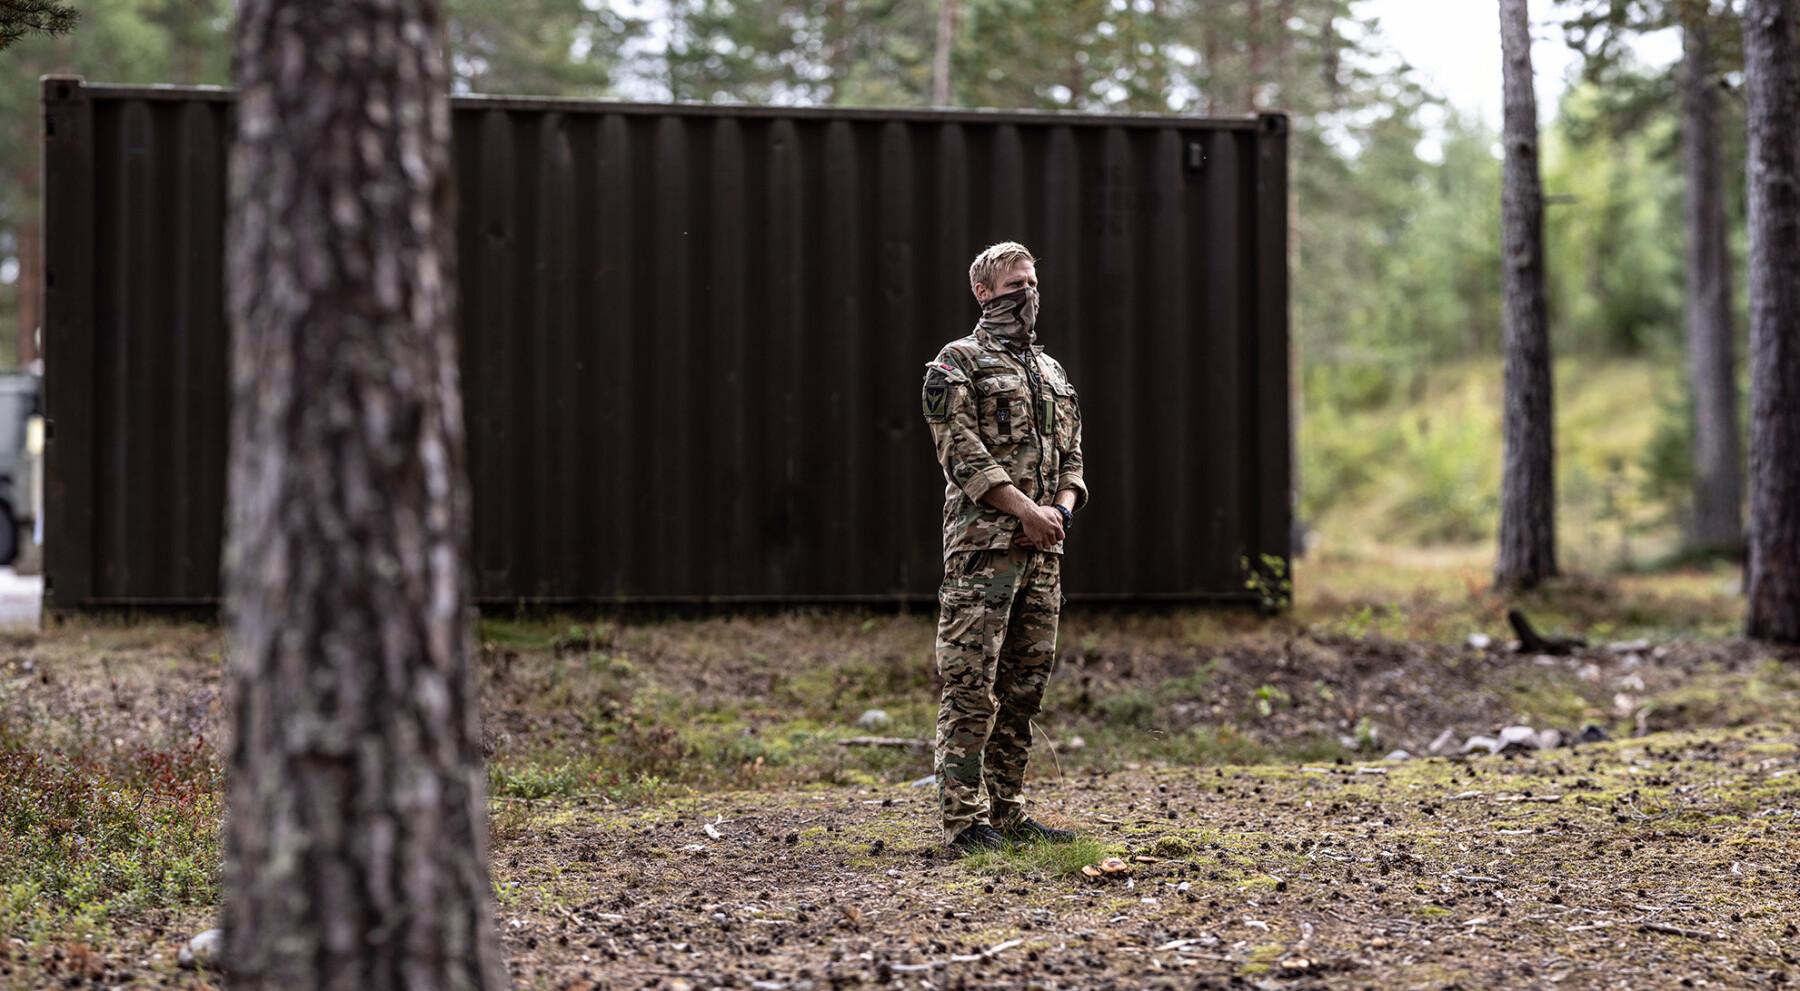 «Eldar» i Forsvarets spesialkommando var den siste norske sjefen i Afghanistan. Han dro hjem i juni 2021.